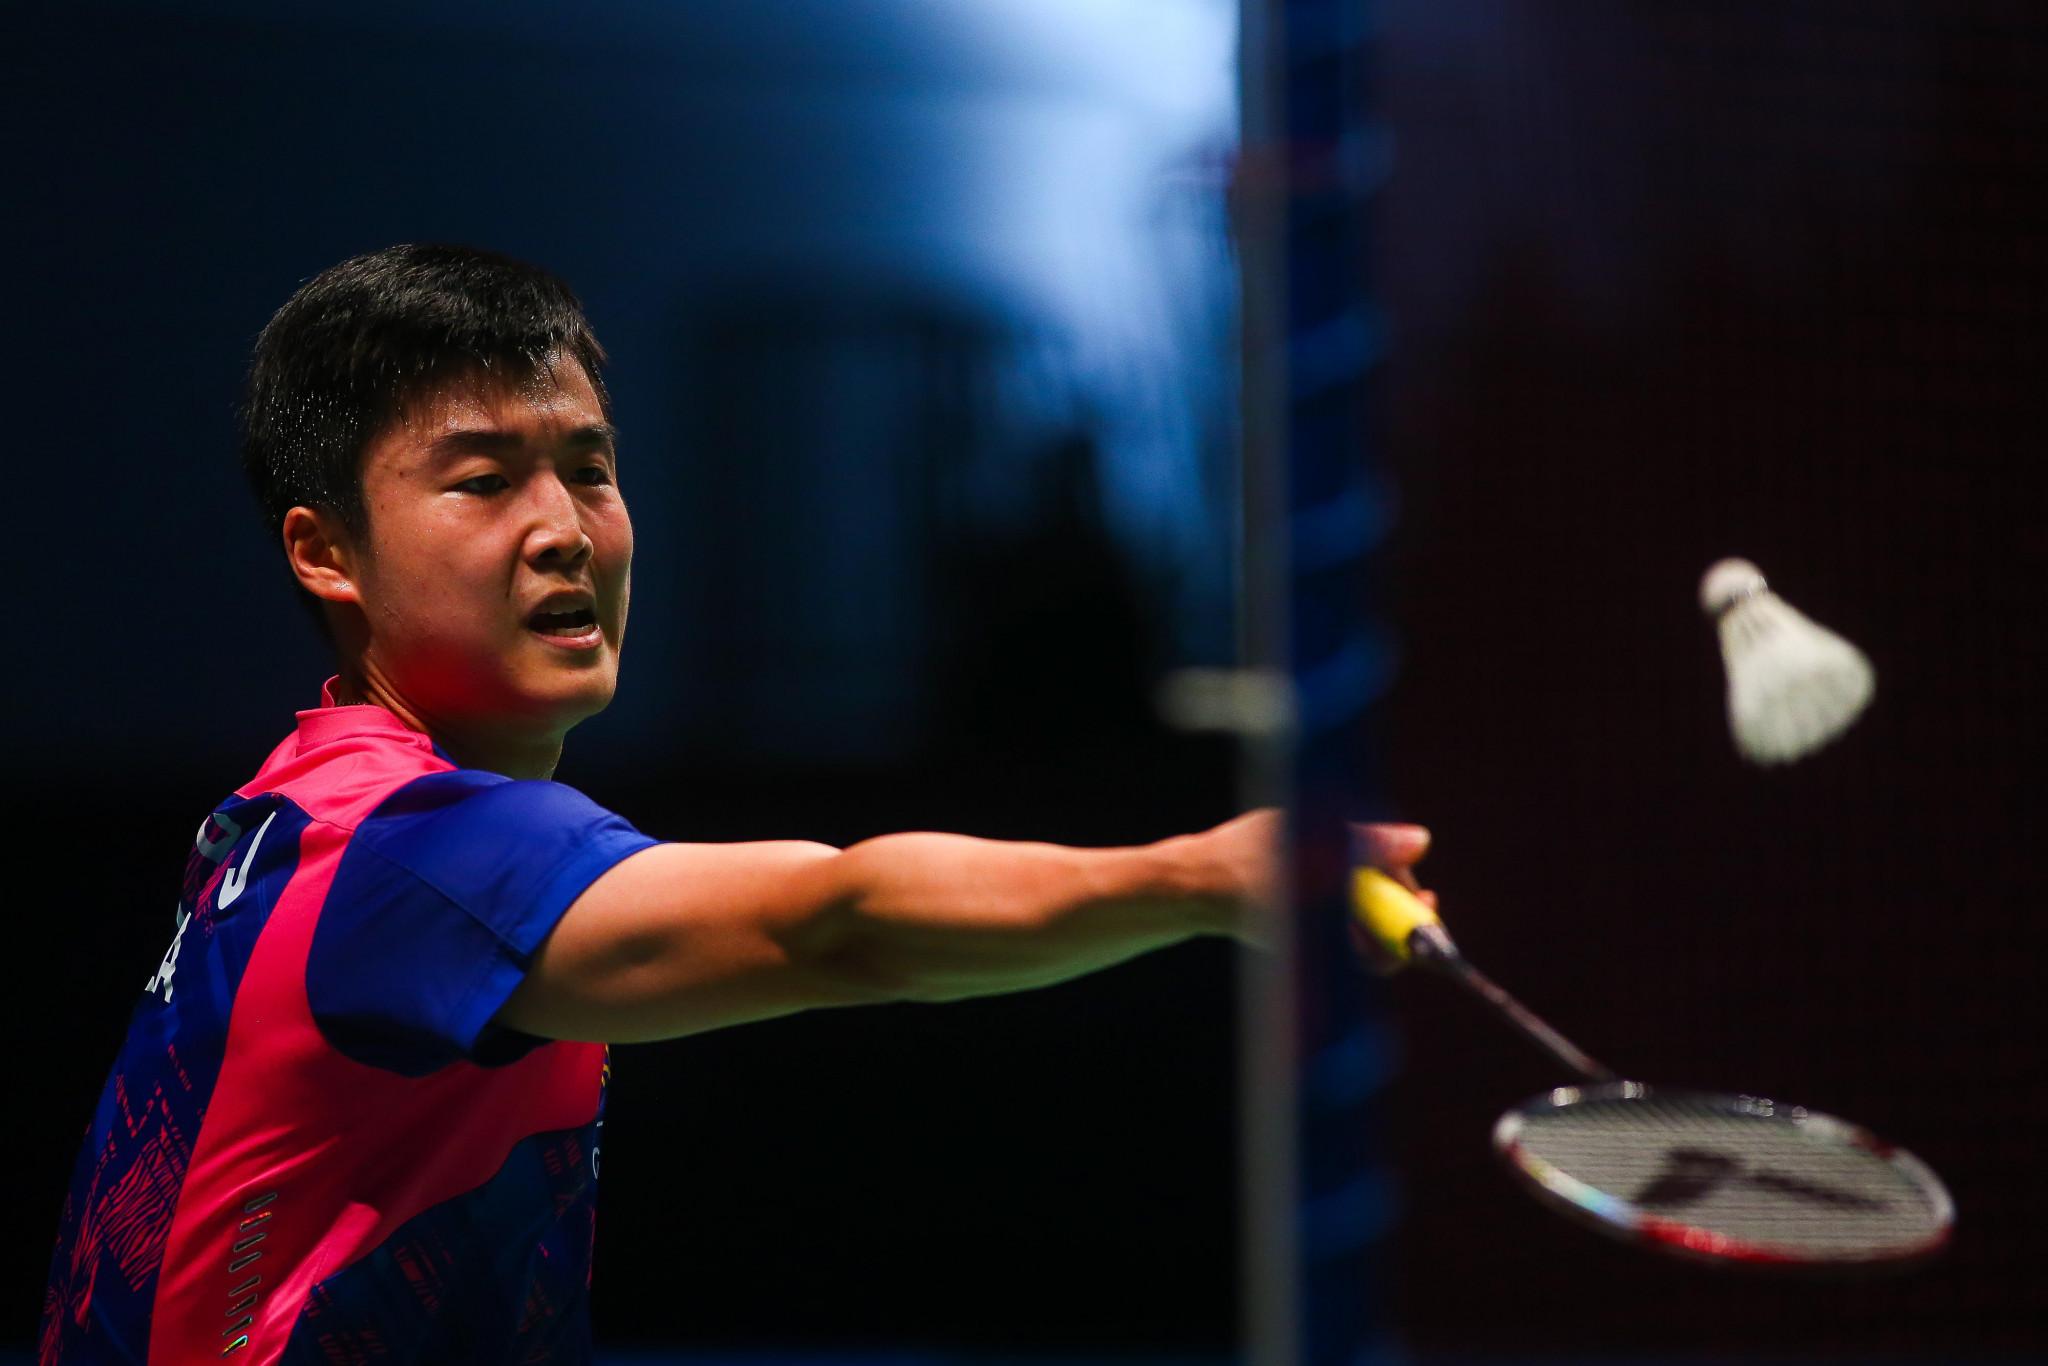 Home favourites storm into finals at BWF Korea Masters